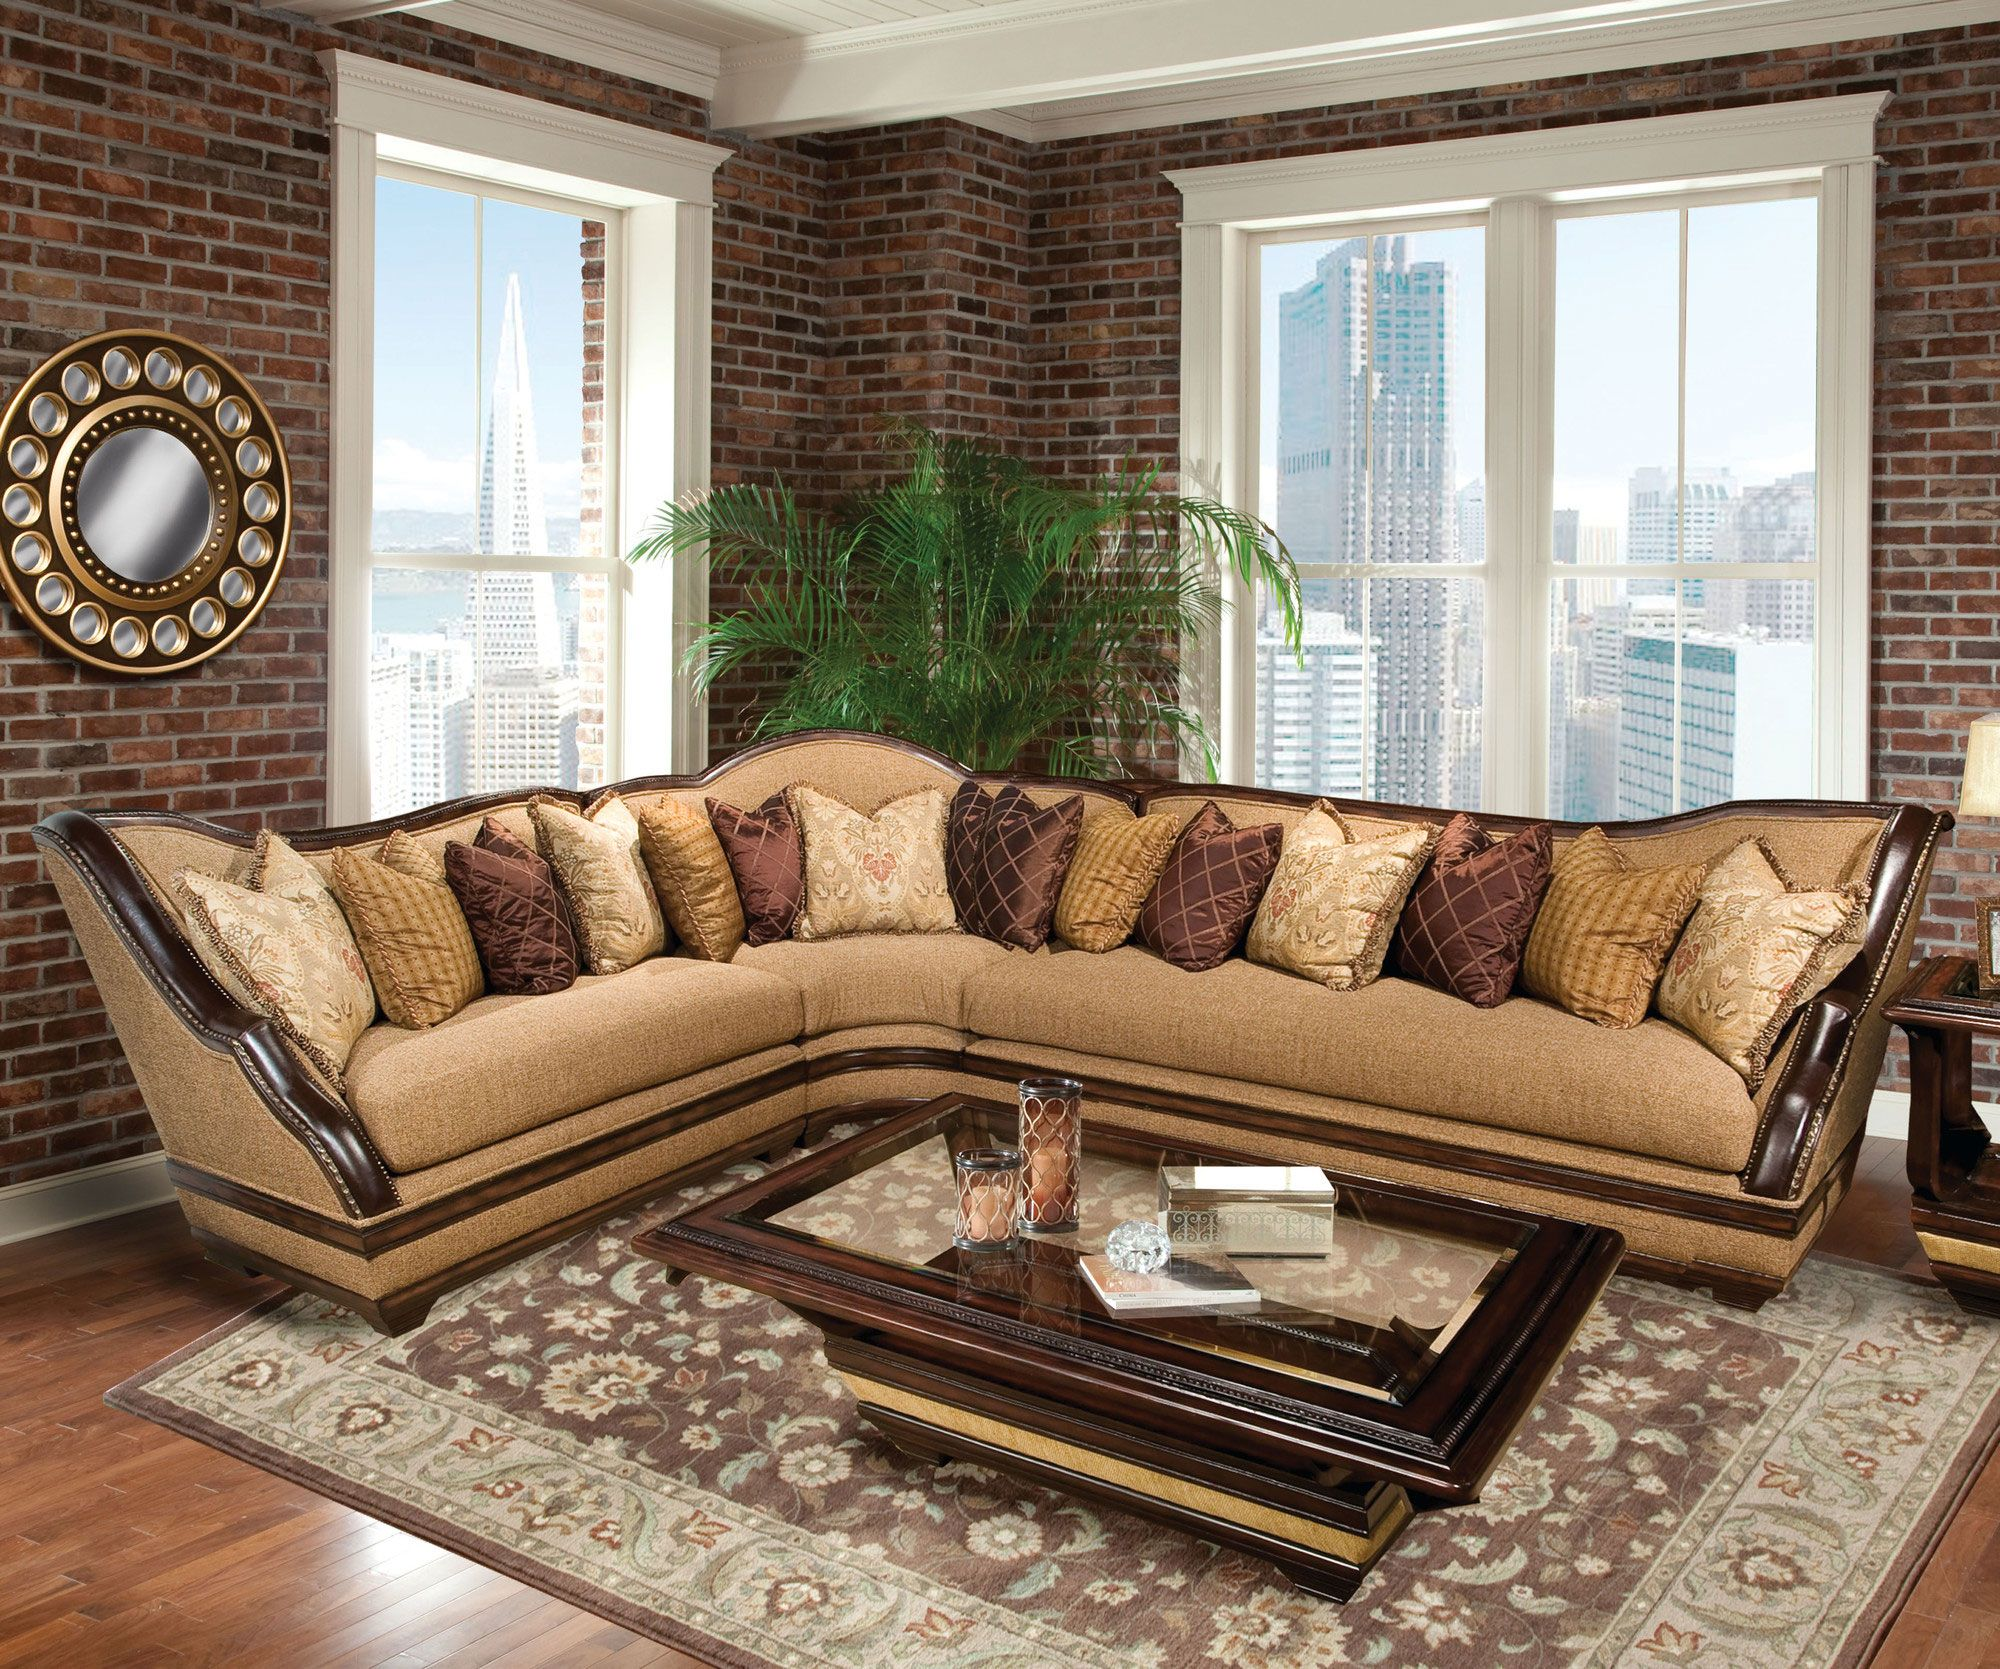 Benetti S Italia Beladonna Wood Trim Sectional Sofa Set The